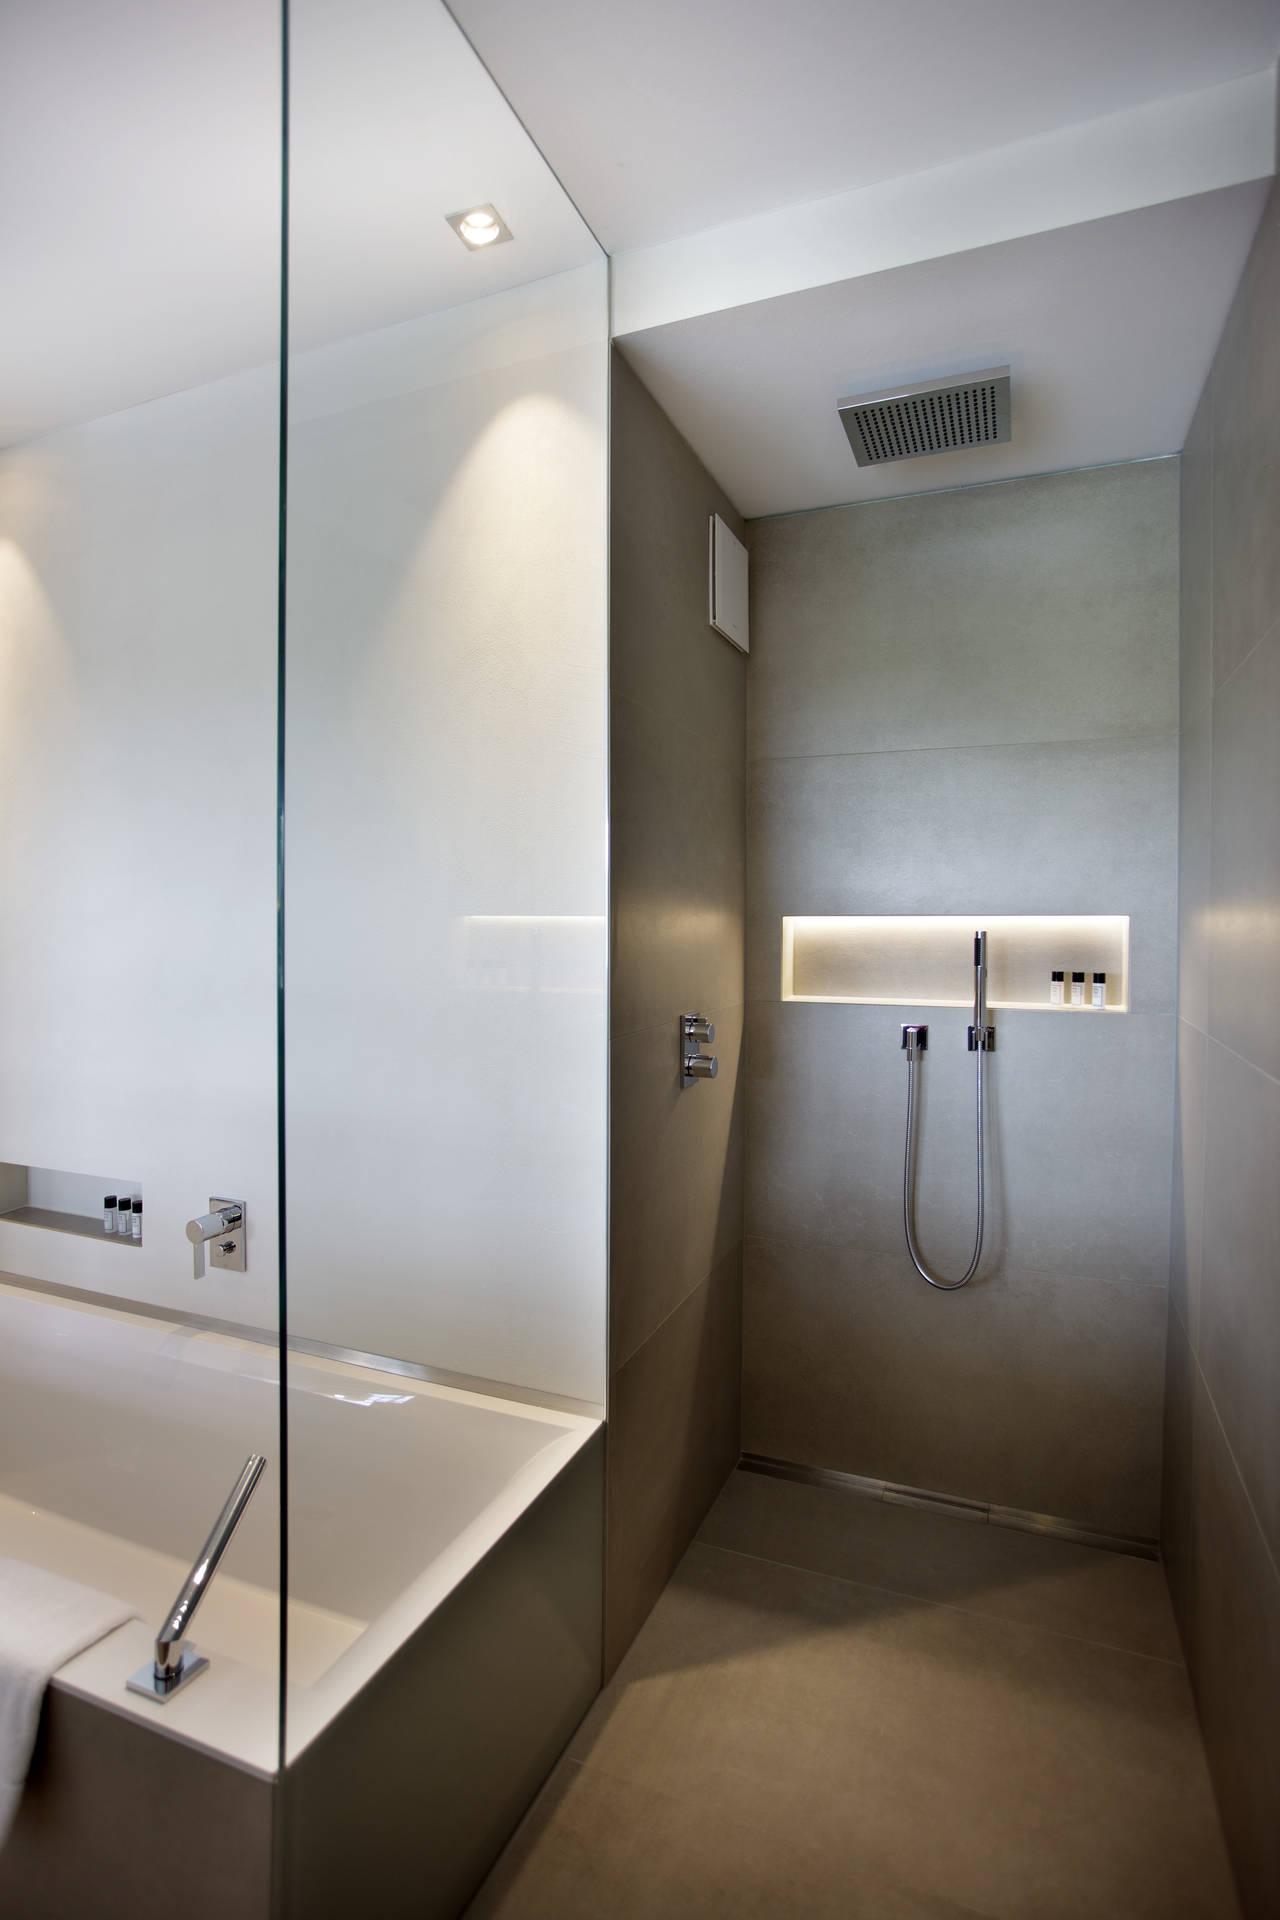 dornbracht per l 39 hotel seegarten a sorpesee germania. Black Bedroom Furniture Sets. Home Design Ideas